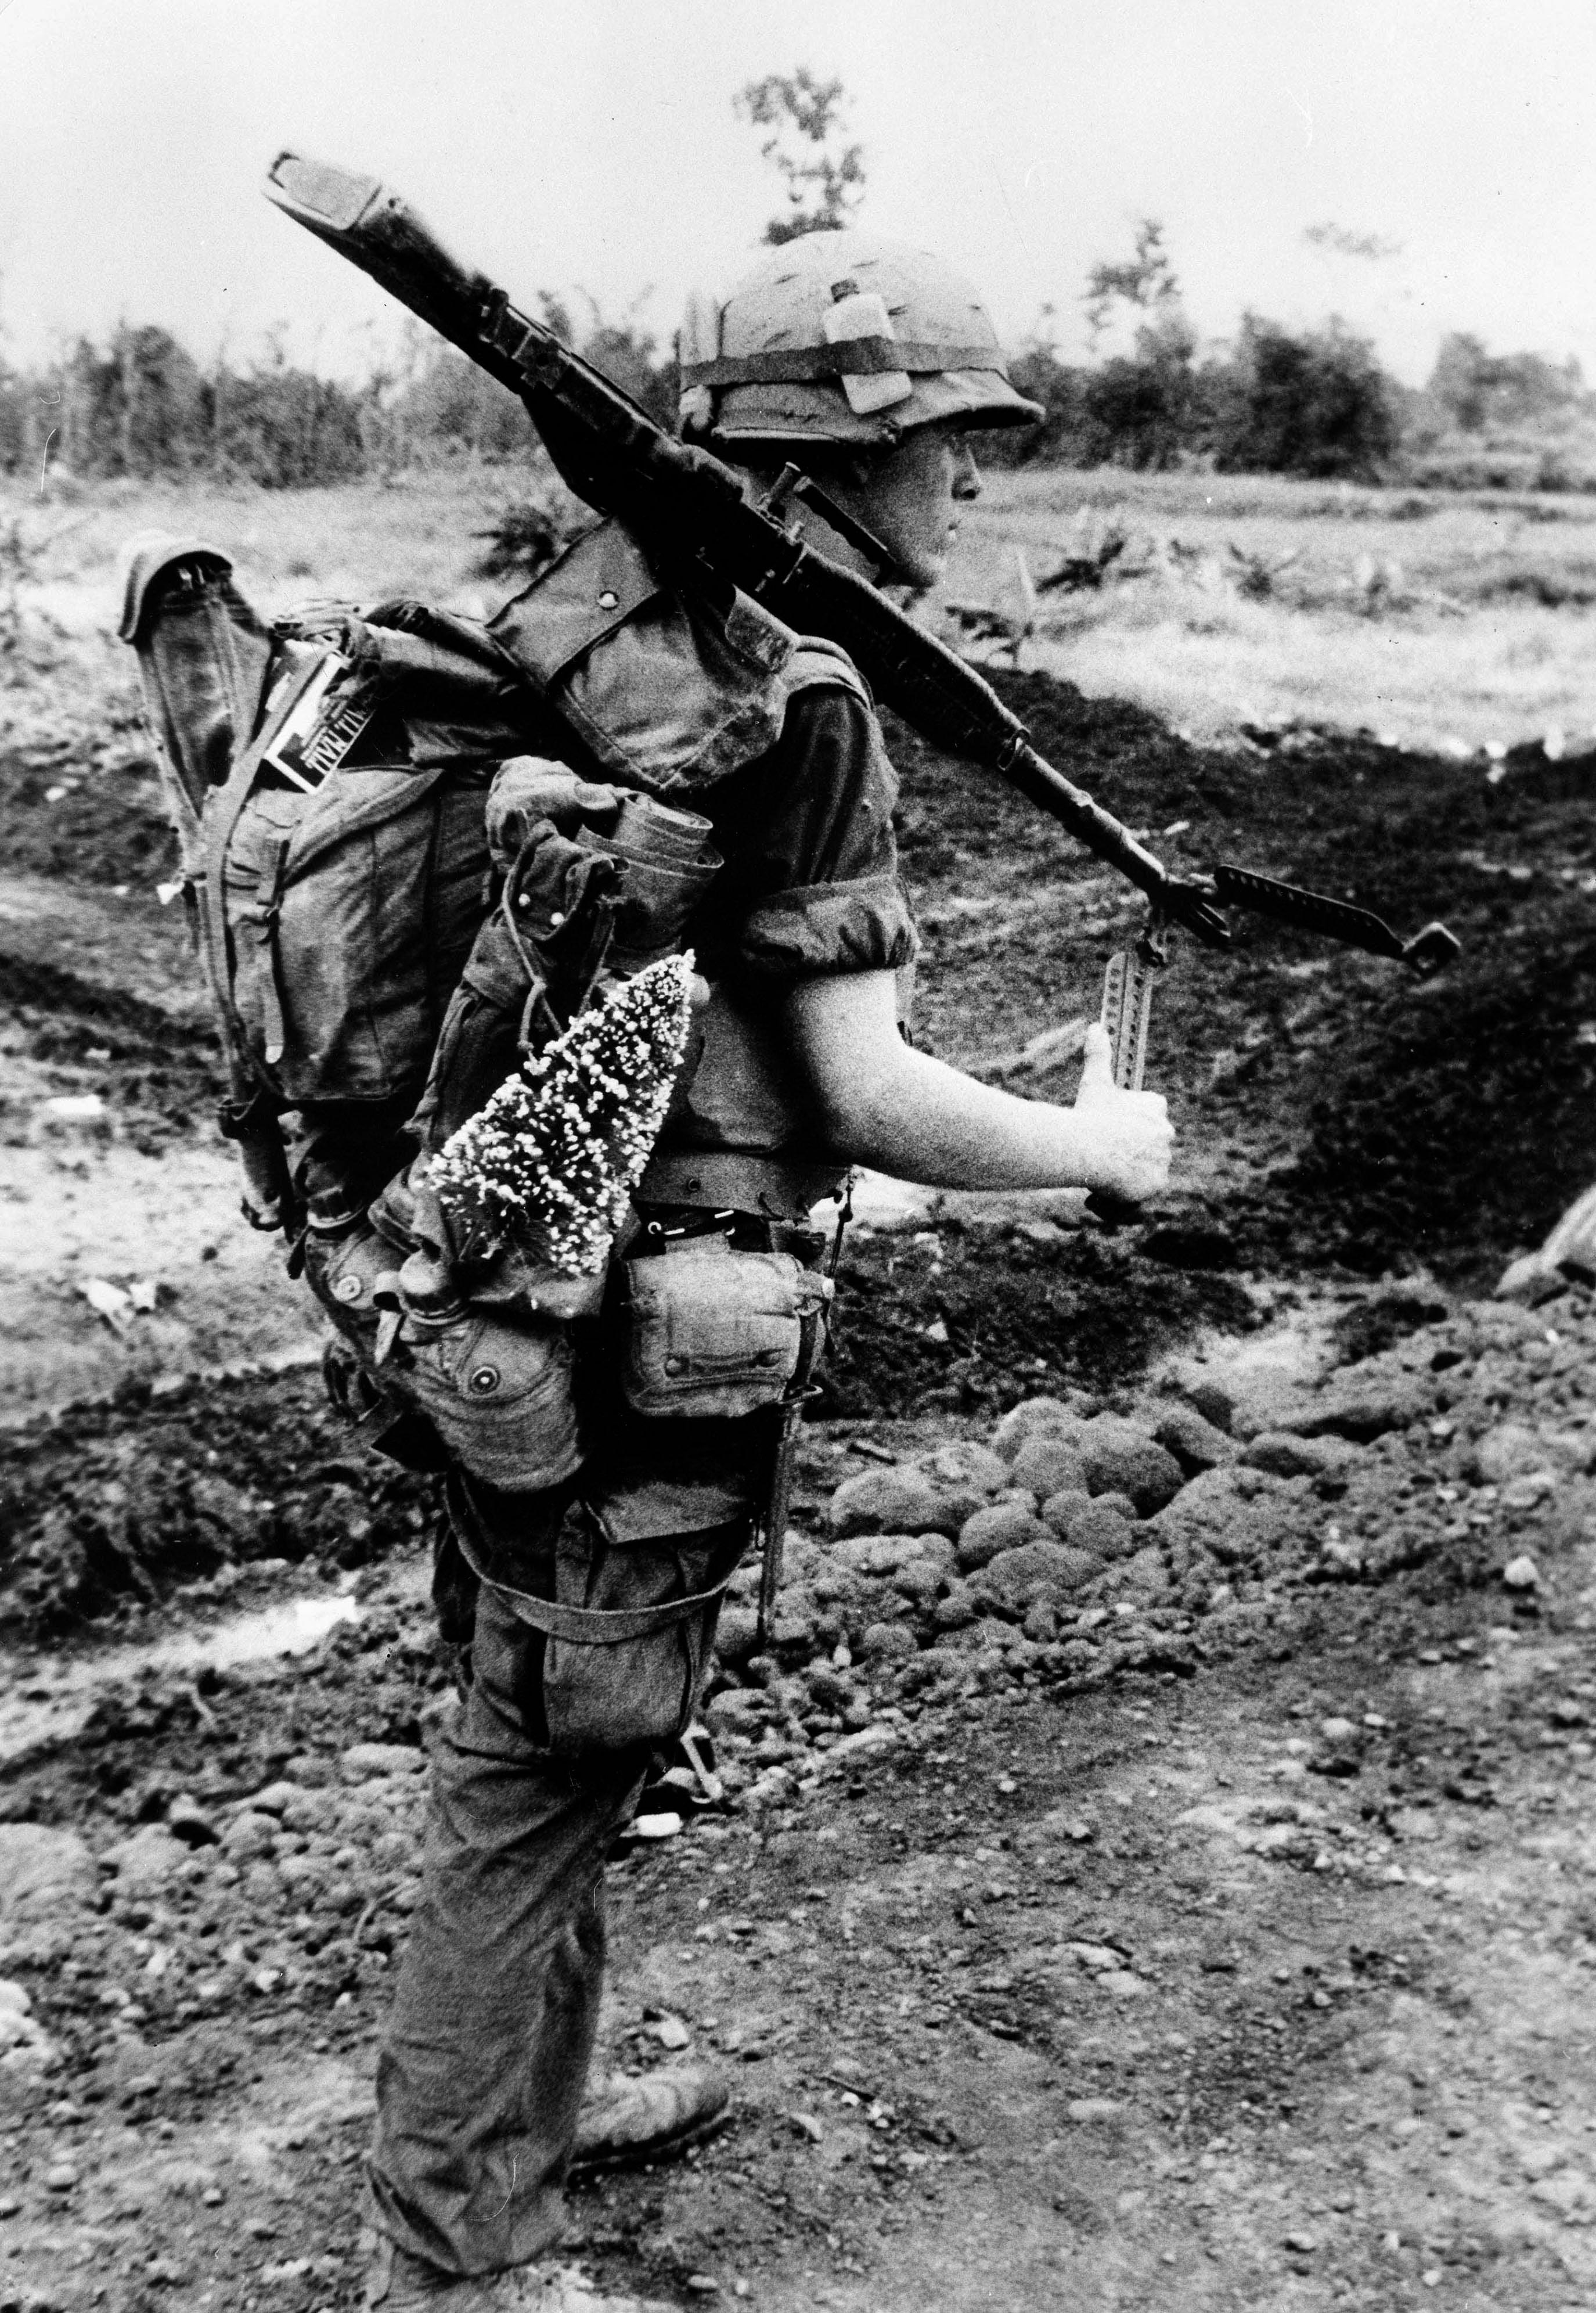 vietnam war - photo #32